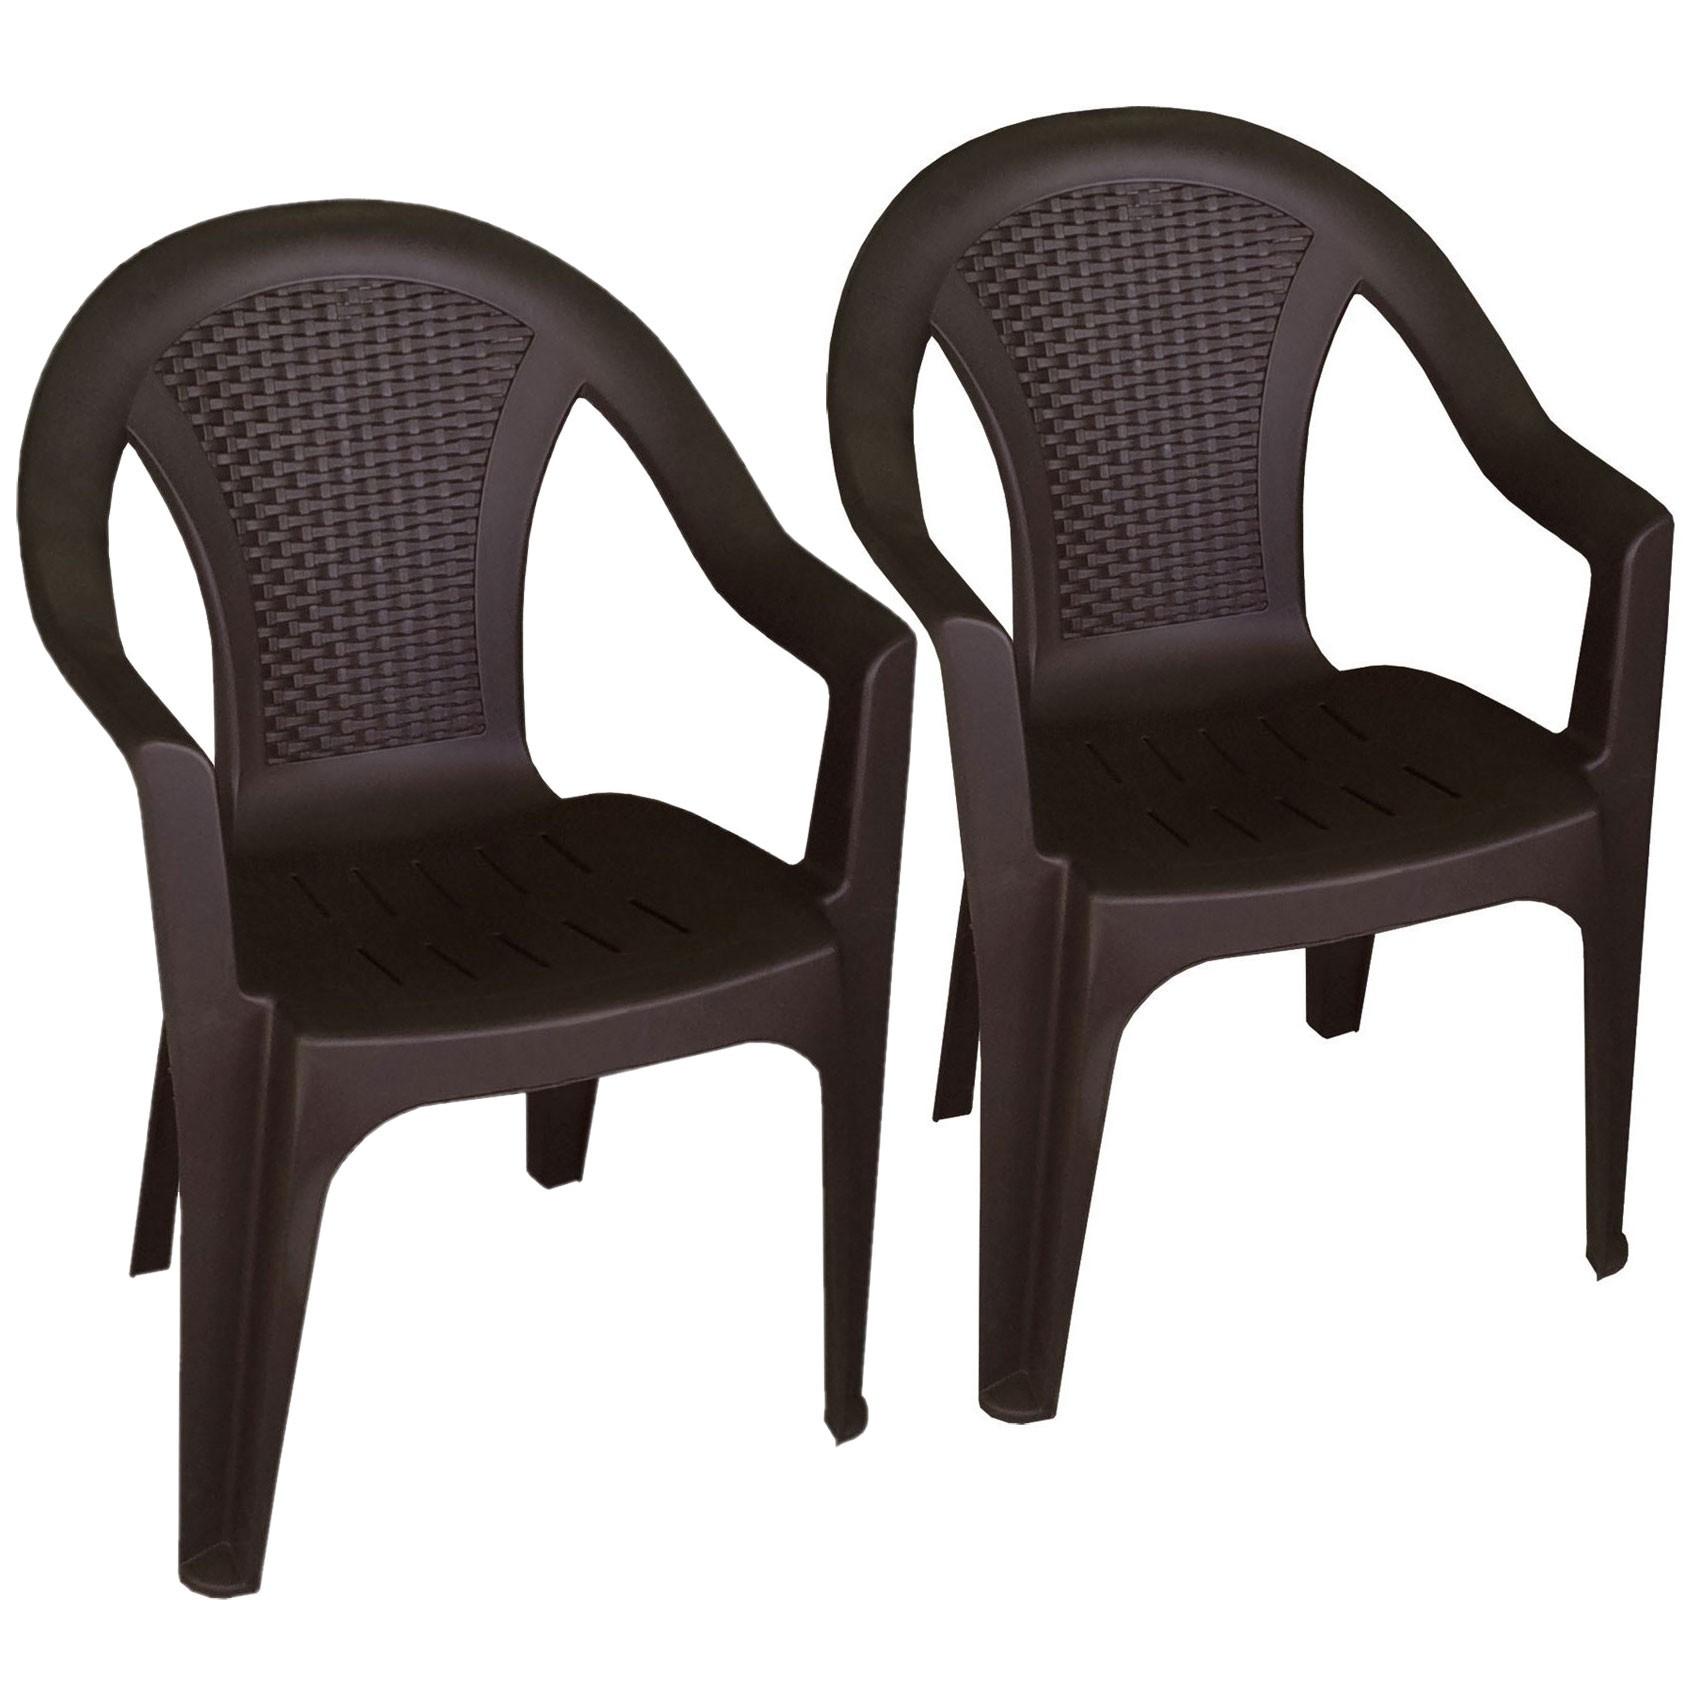 2 st ck stapelstuhl ischia mokka garten gartenm bel gartenst hle stapelst hle. Black Bedroom Furniture Sets. Home Design Ideas